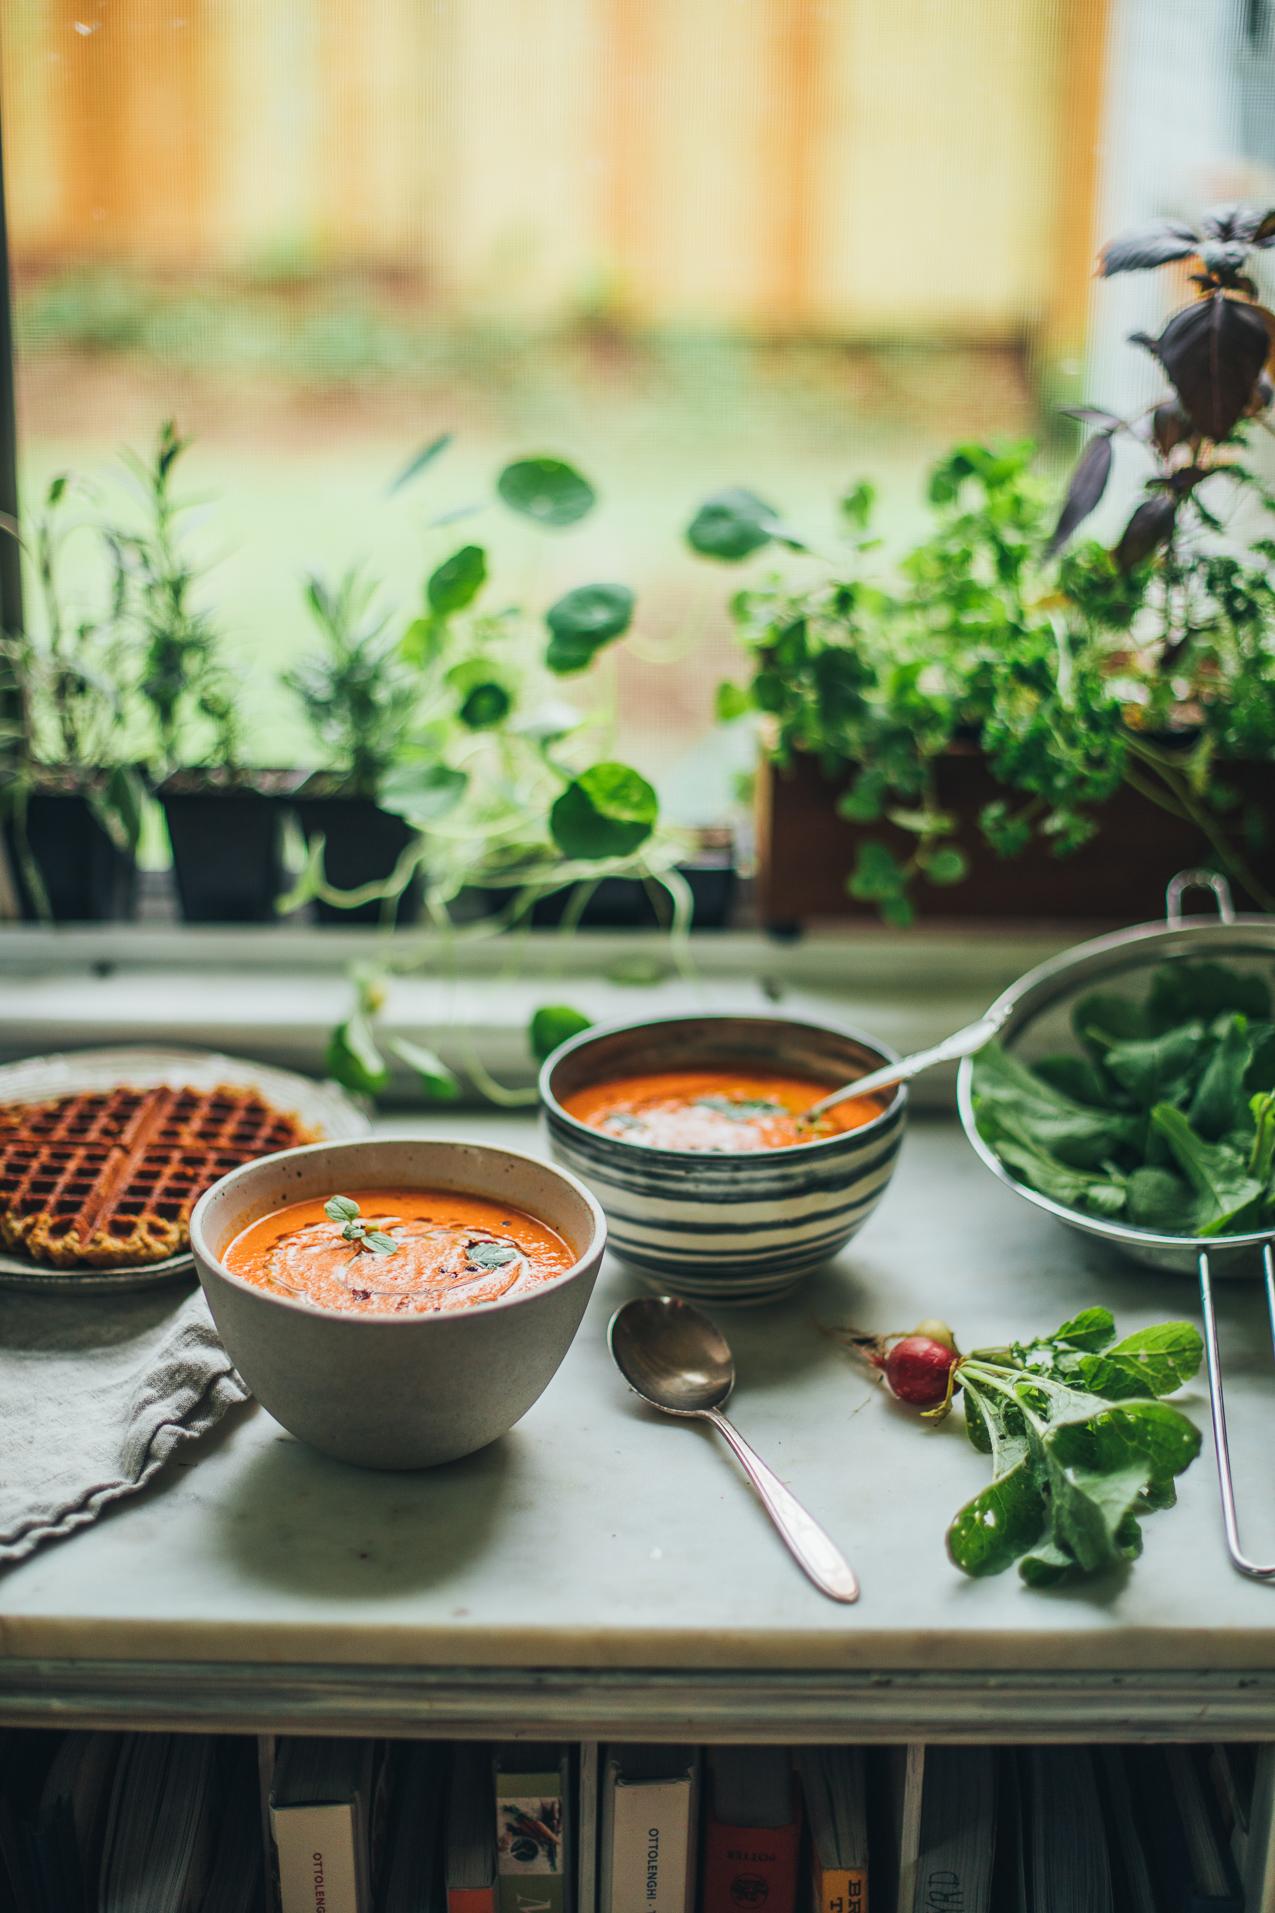 tomato-soup-almond-waffles-6021.jpg